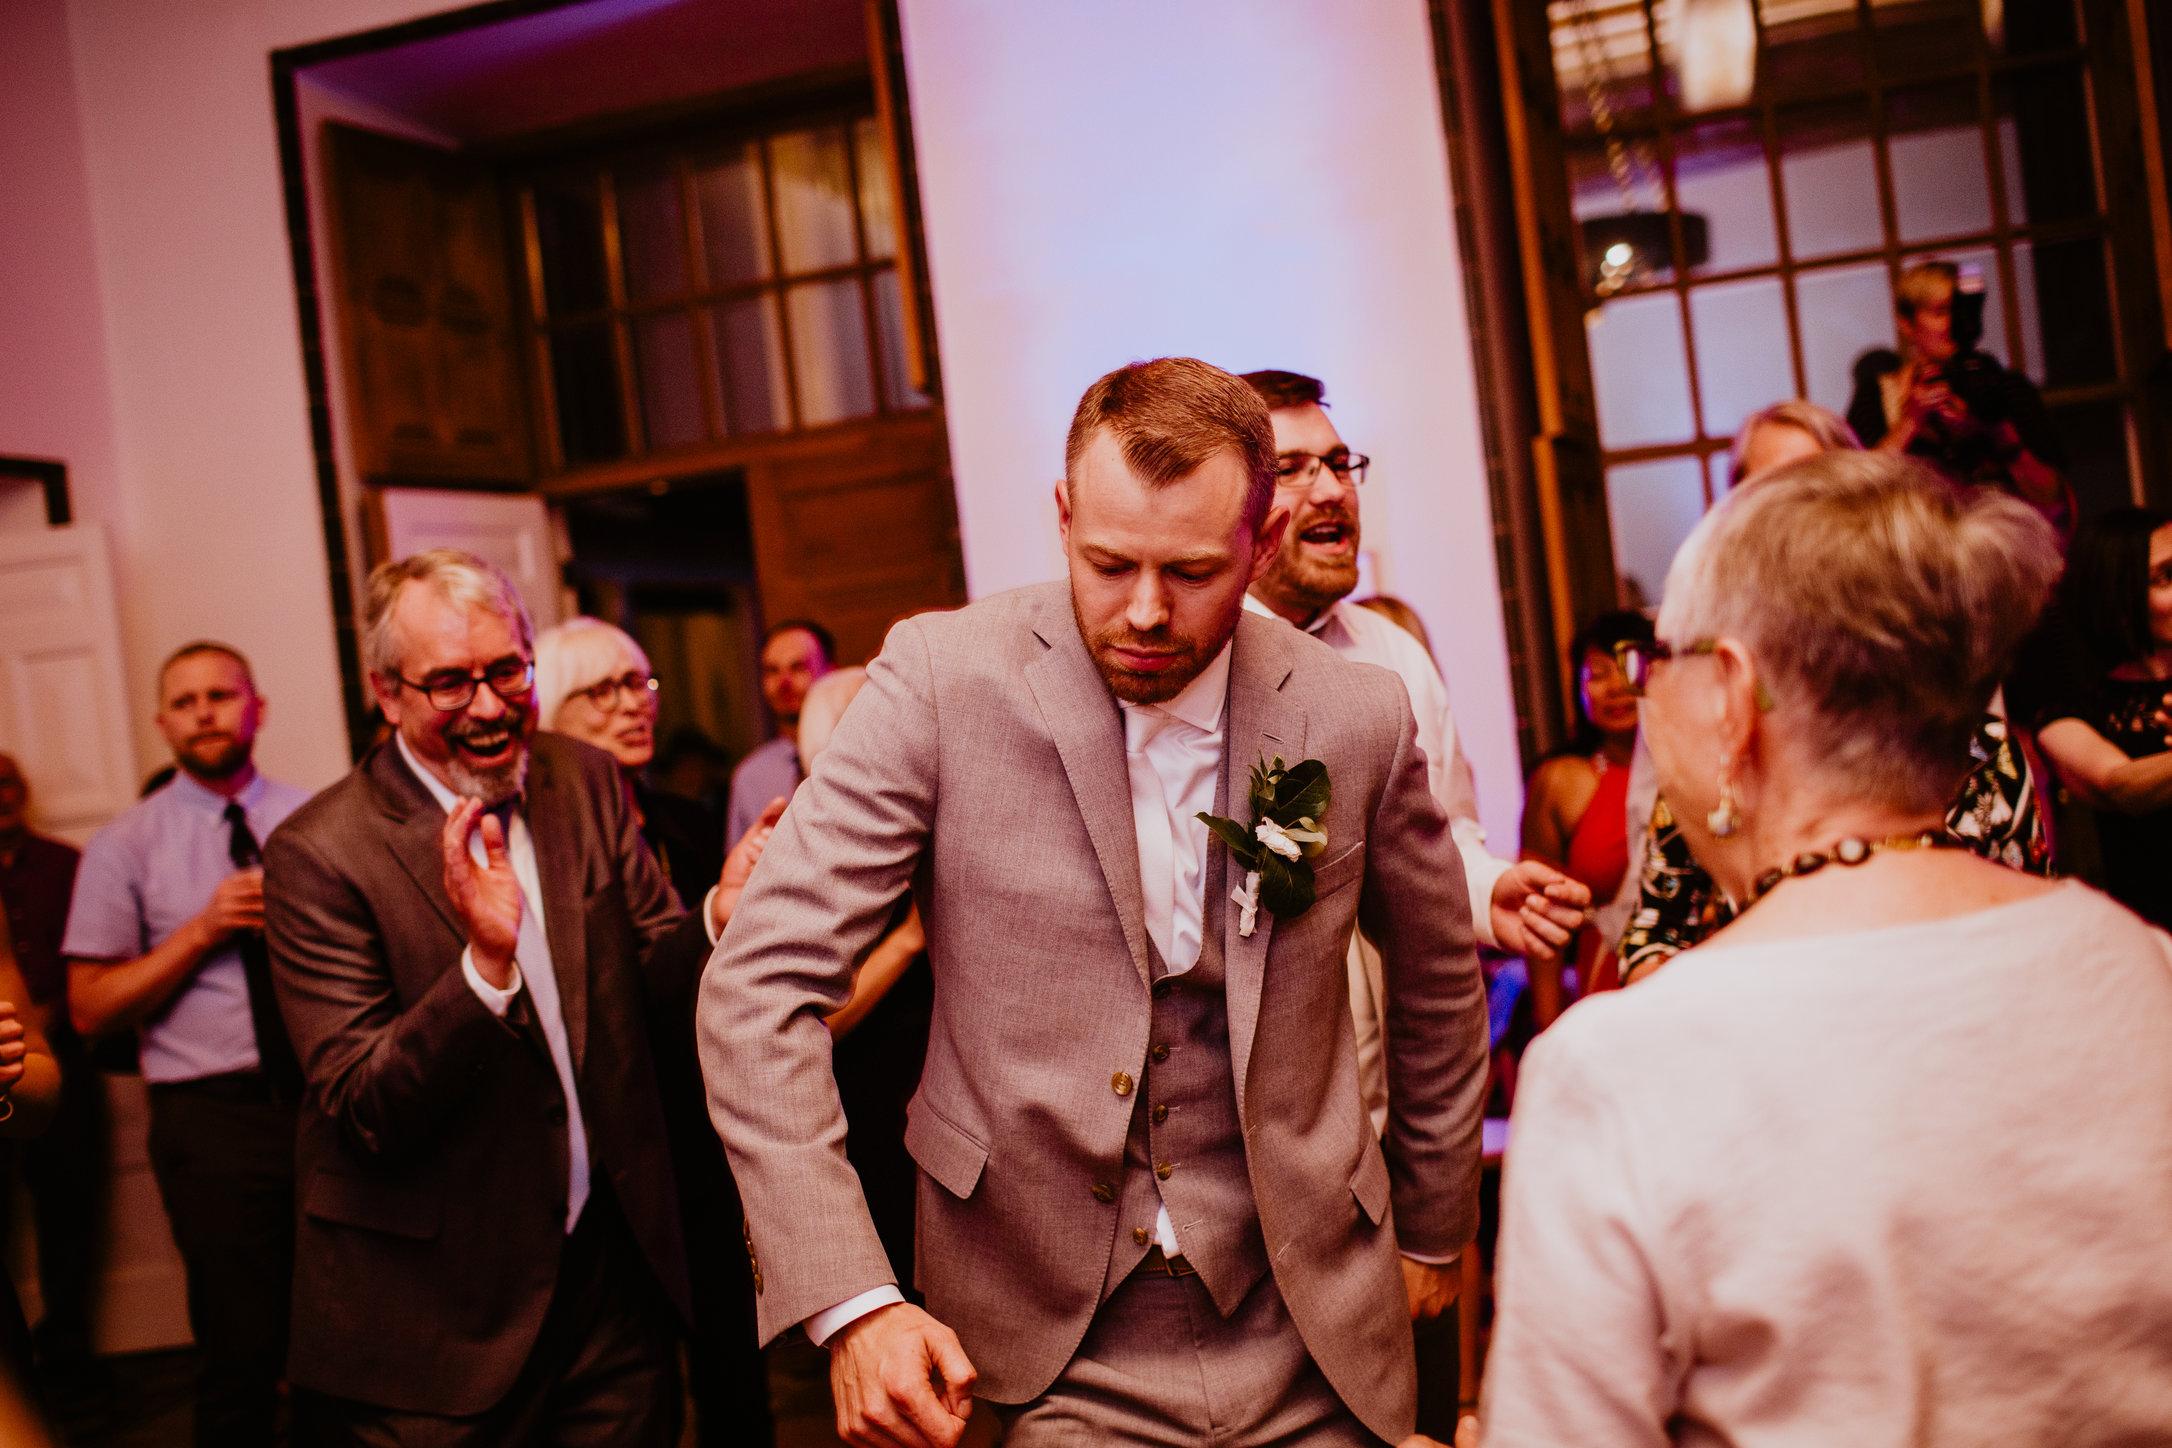 DandA-wedding-844.jpg